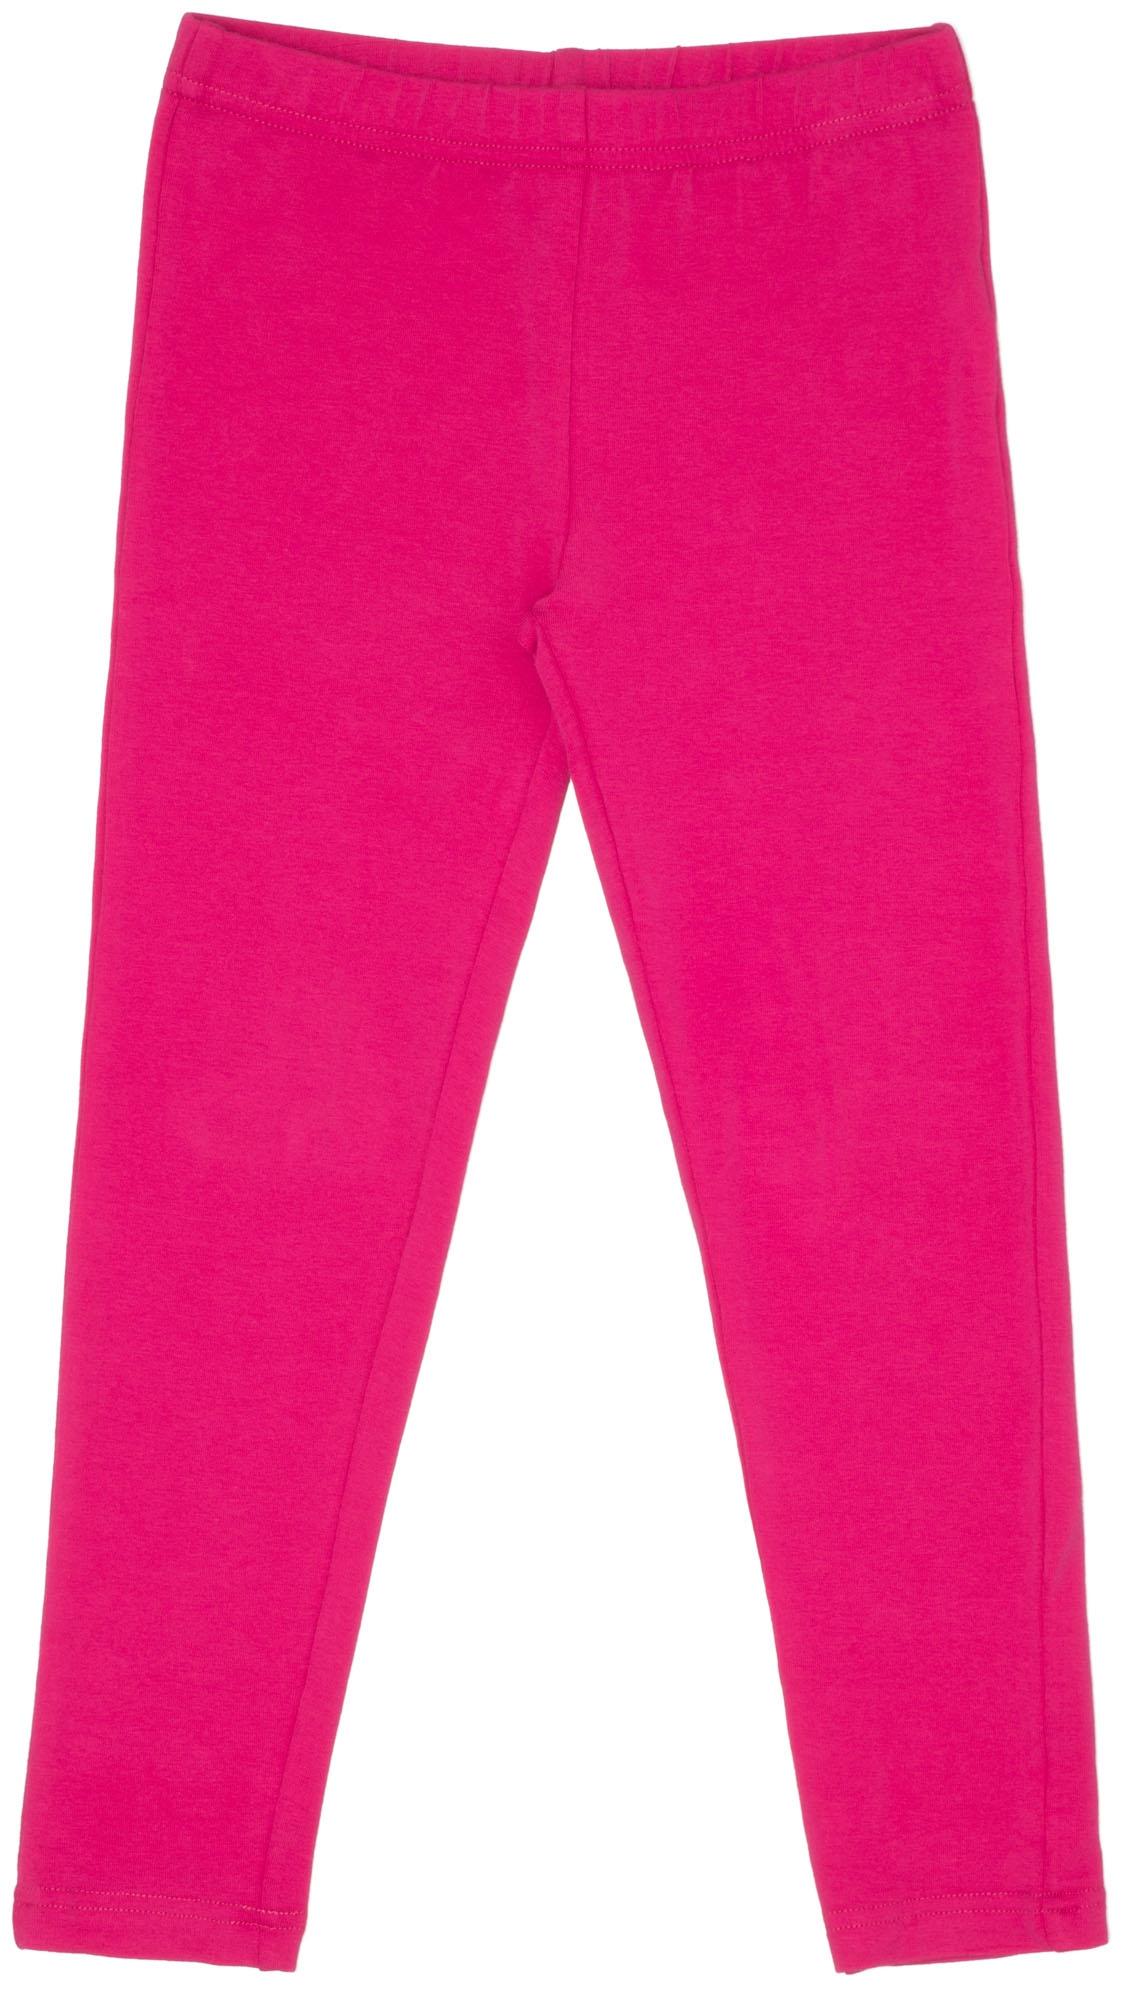 Брюки и леггинсы Barkito Леггинсы для девочки Спорт Barkito фуксия брюки джинсы и штанишки coccodrillo леггинсы для девочки basic girl звезды